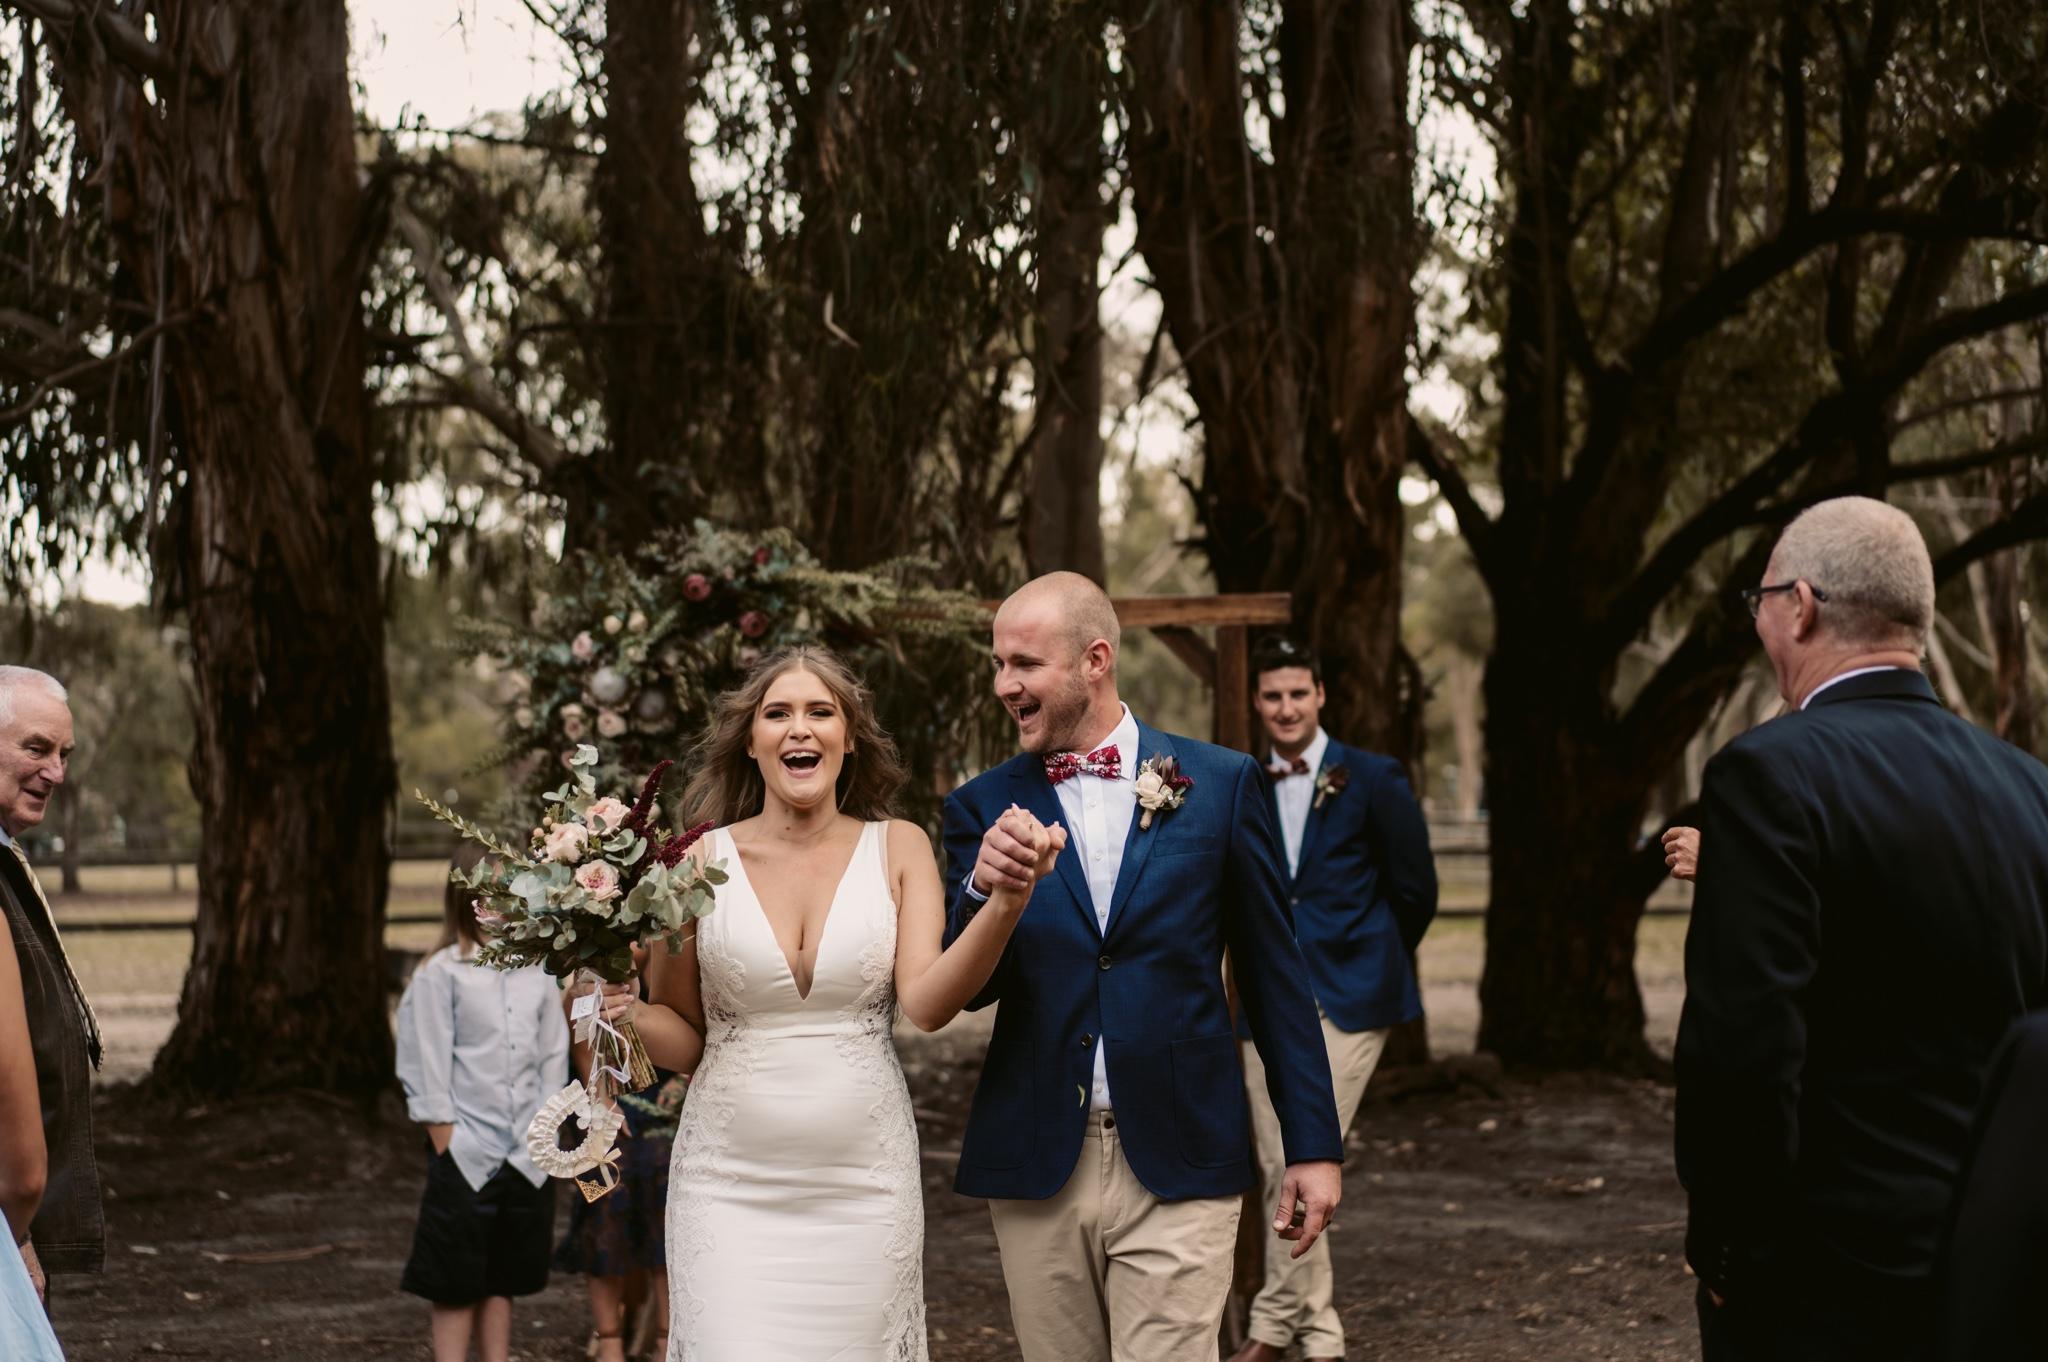 Mornington Peninsula Wedding Photography58.jpg